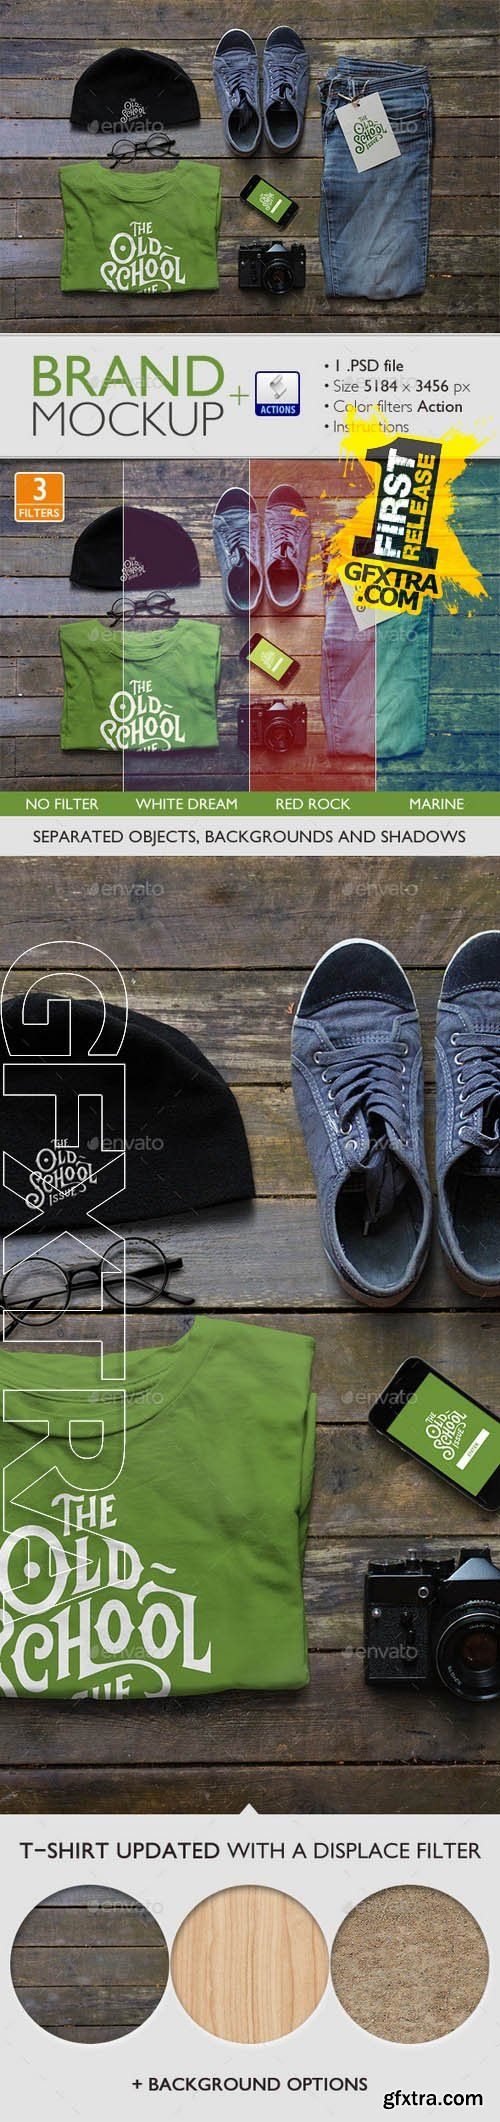 Brand Mockup Template - Graphicriver 9342584